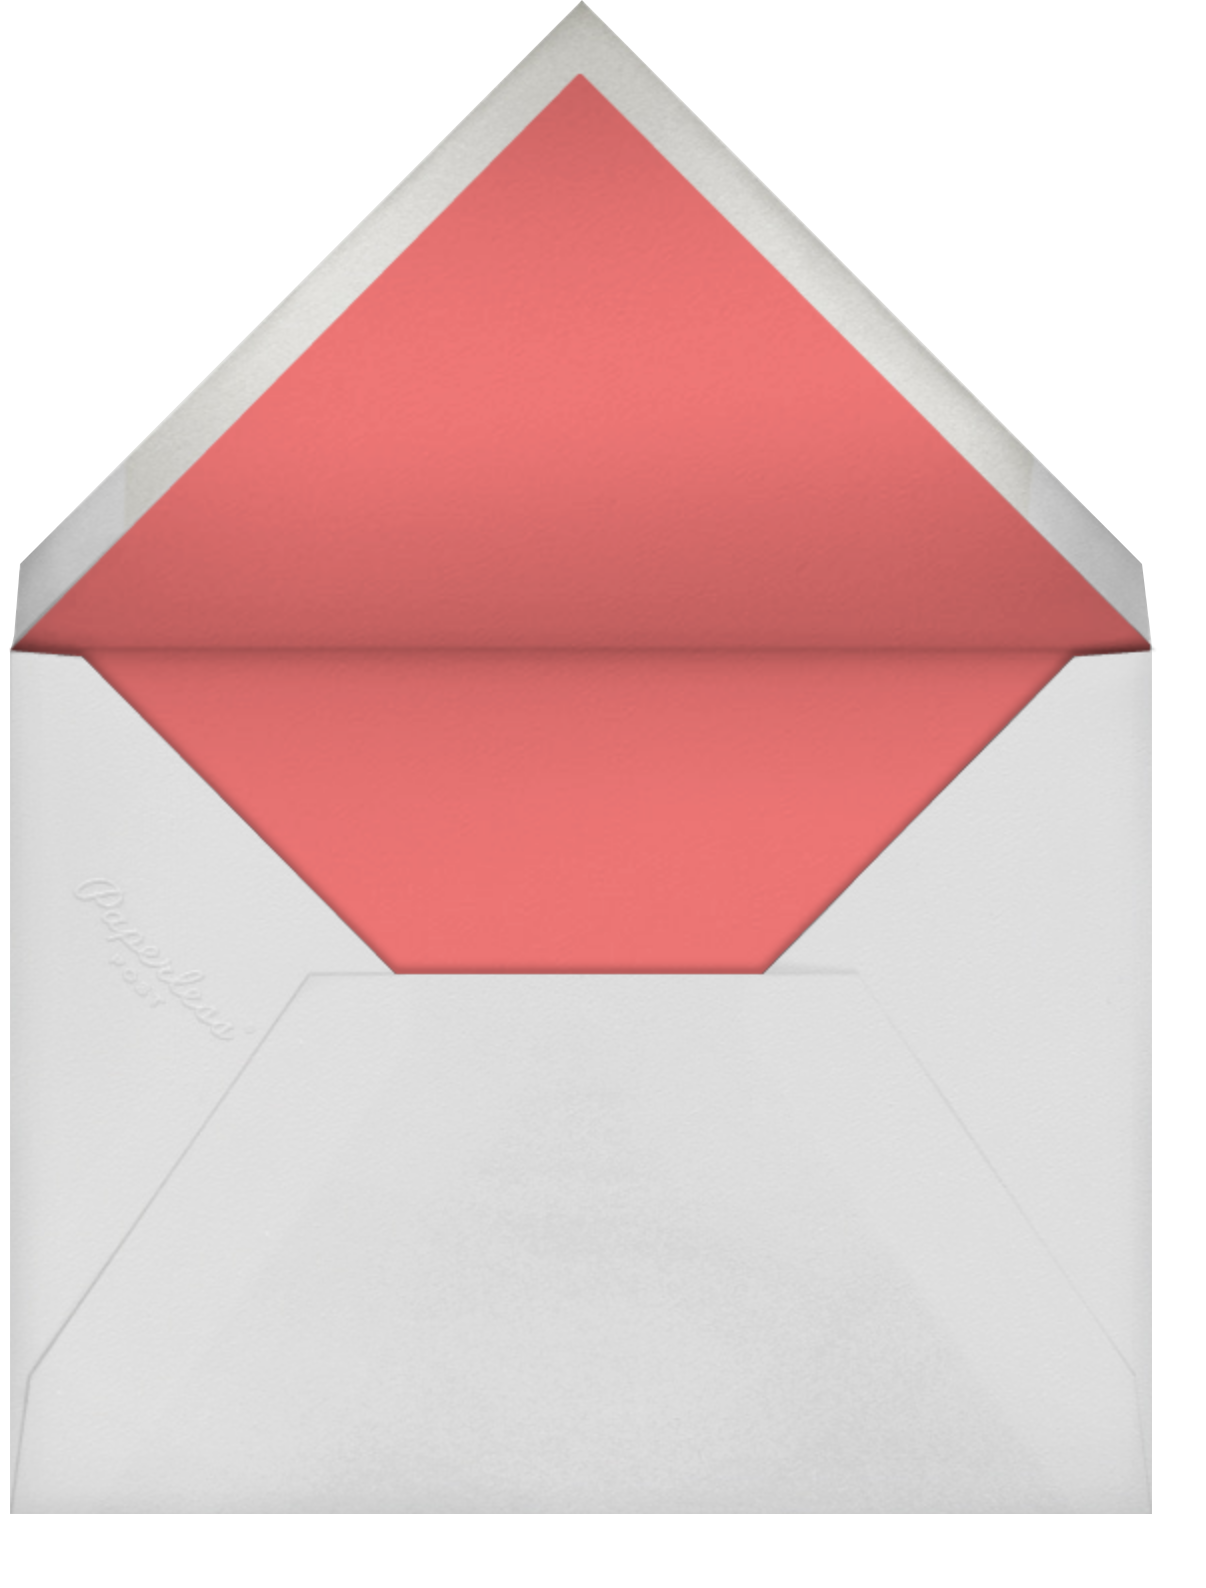 Tableau (Invitation) - Paperless Post - Memorial service - envelope back